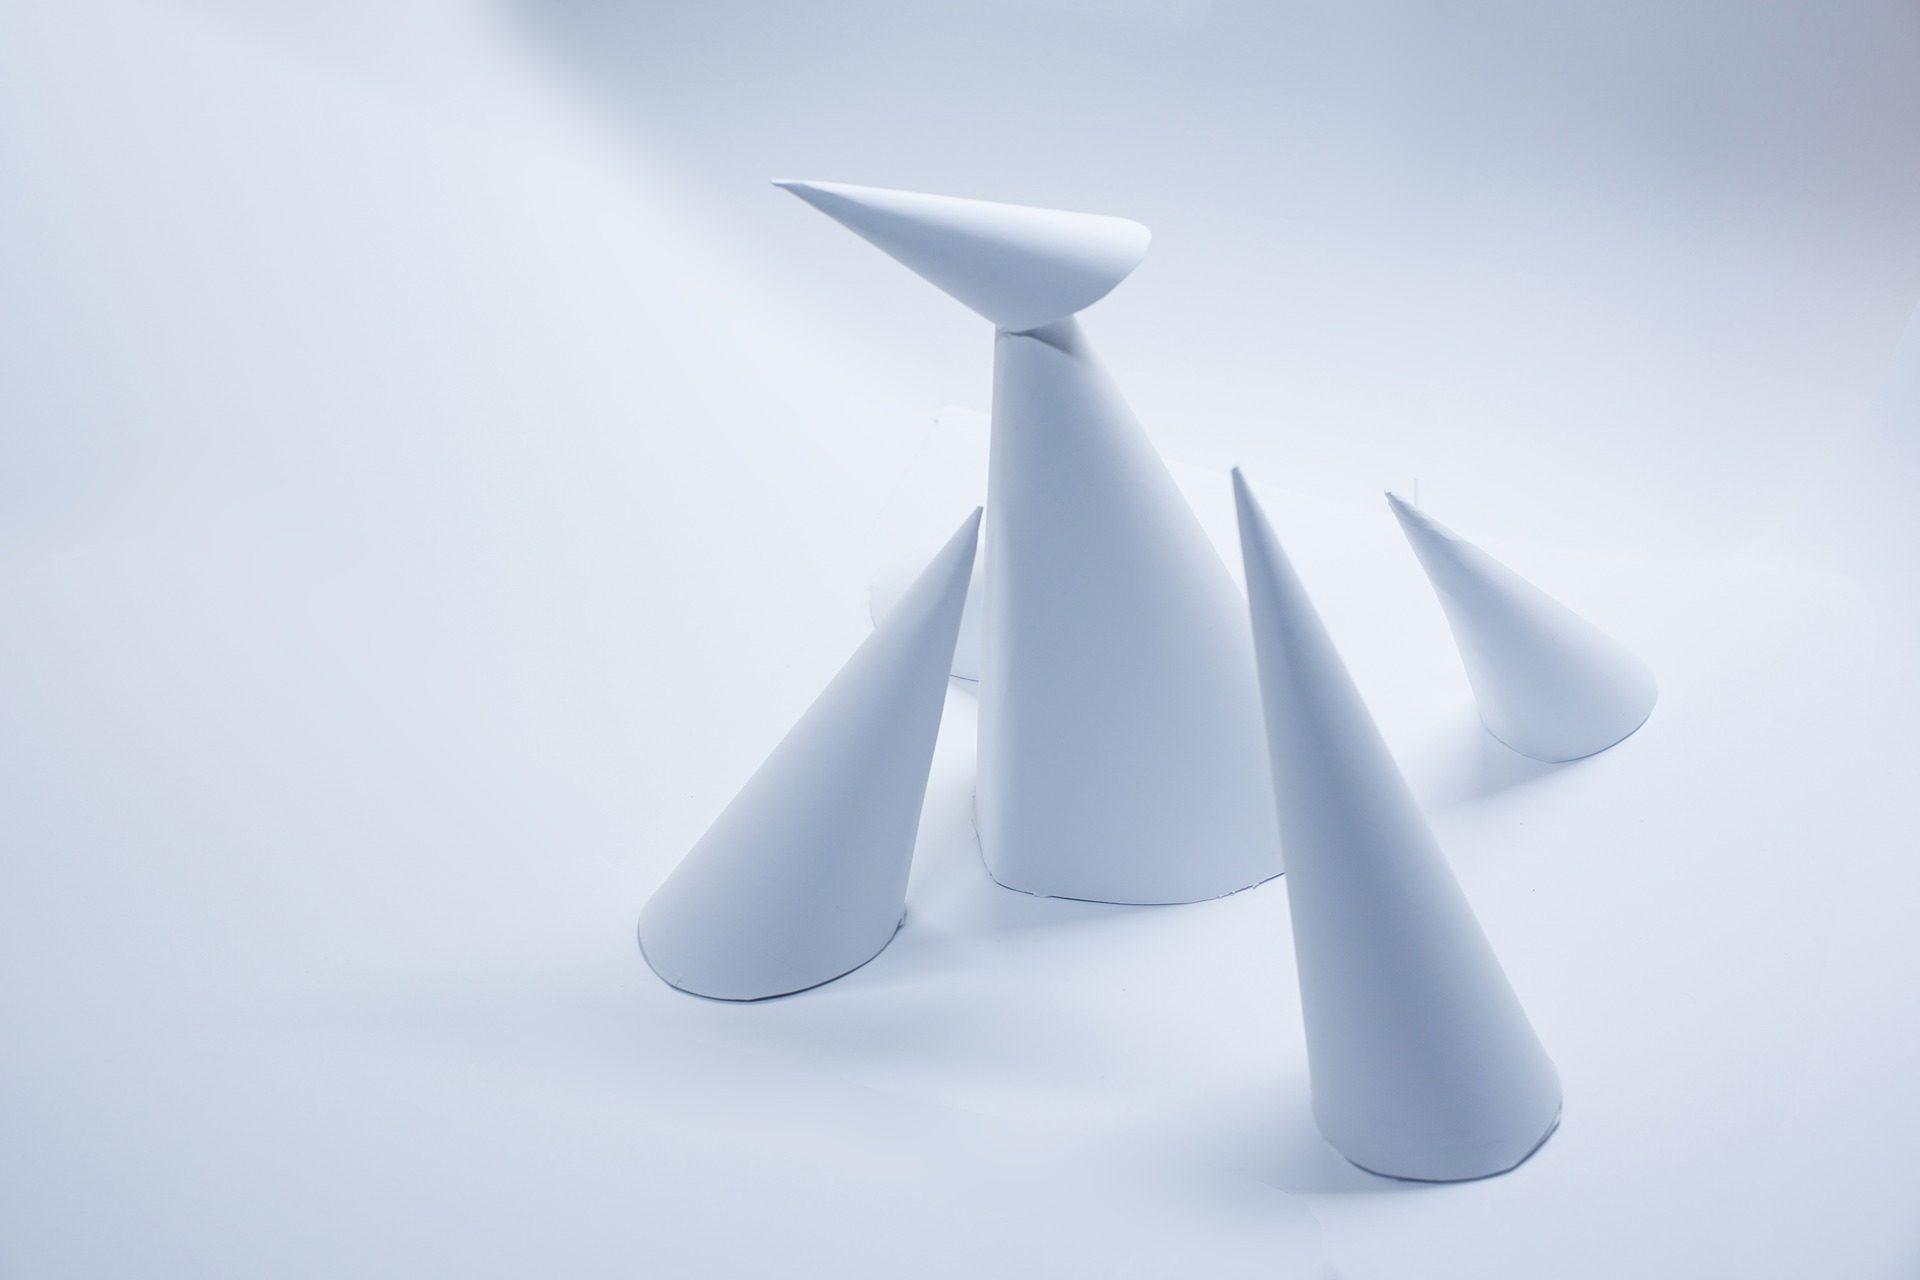 conos, papel, figuras, papiroflexia, modelado - Fondos de Pantalla HD - professor-falken.com